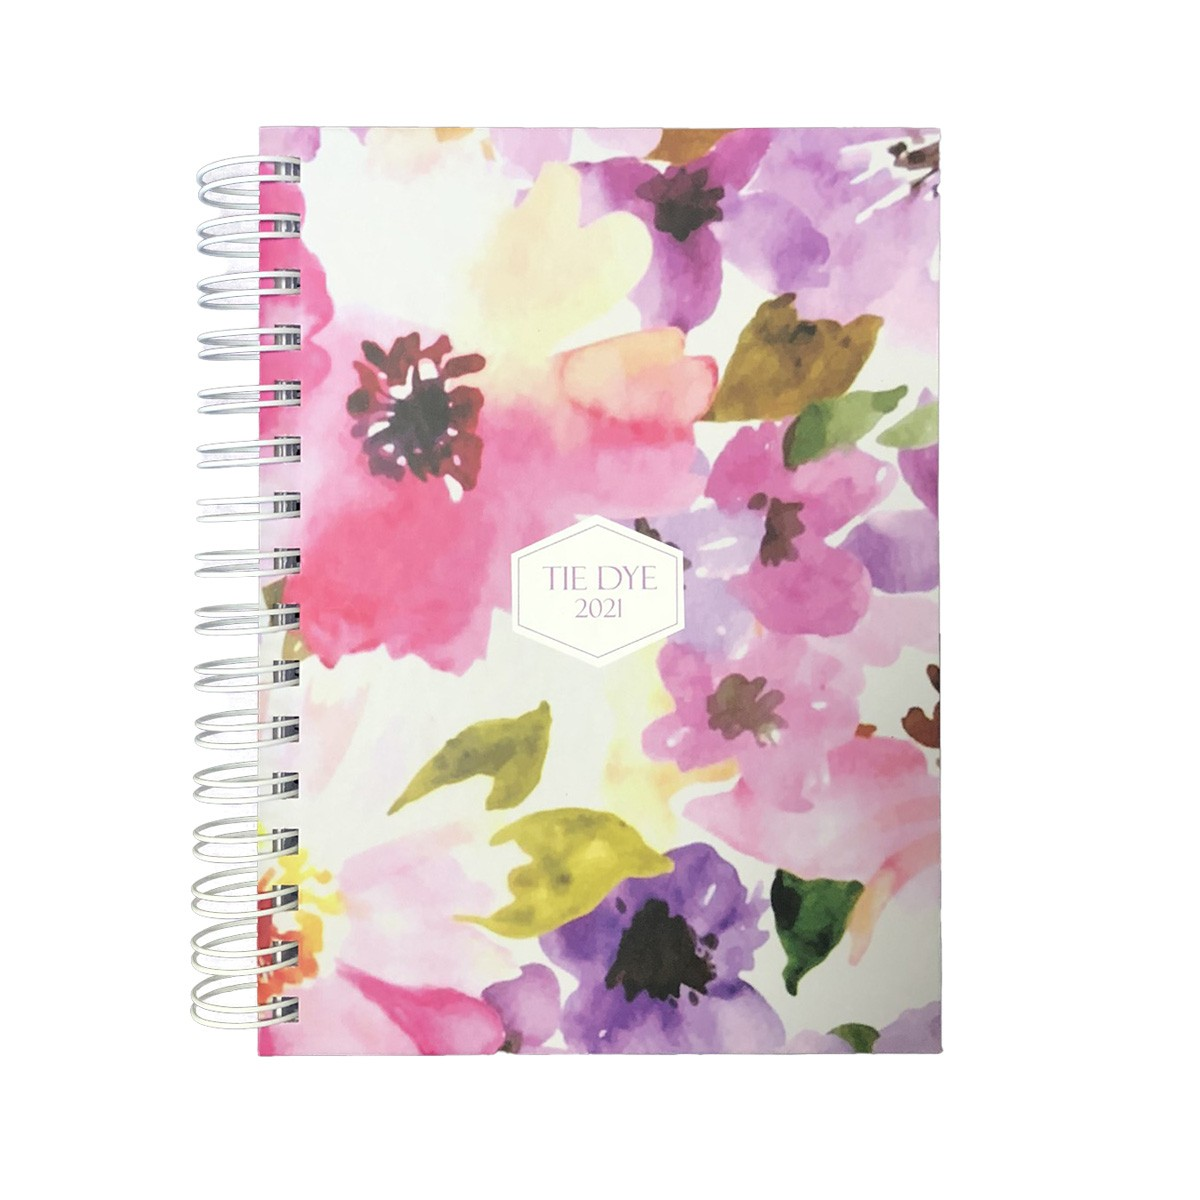 Agenda Pautada A5 168fls 2021 Tie Dye Flower Pink doSul